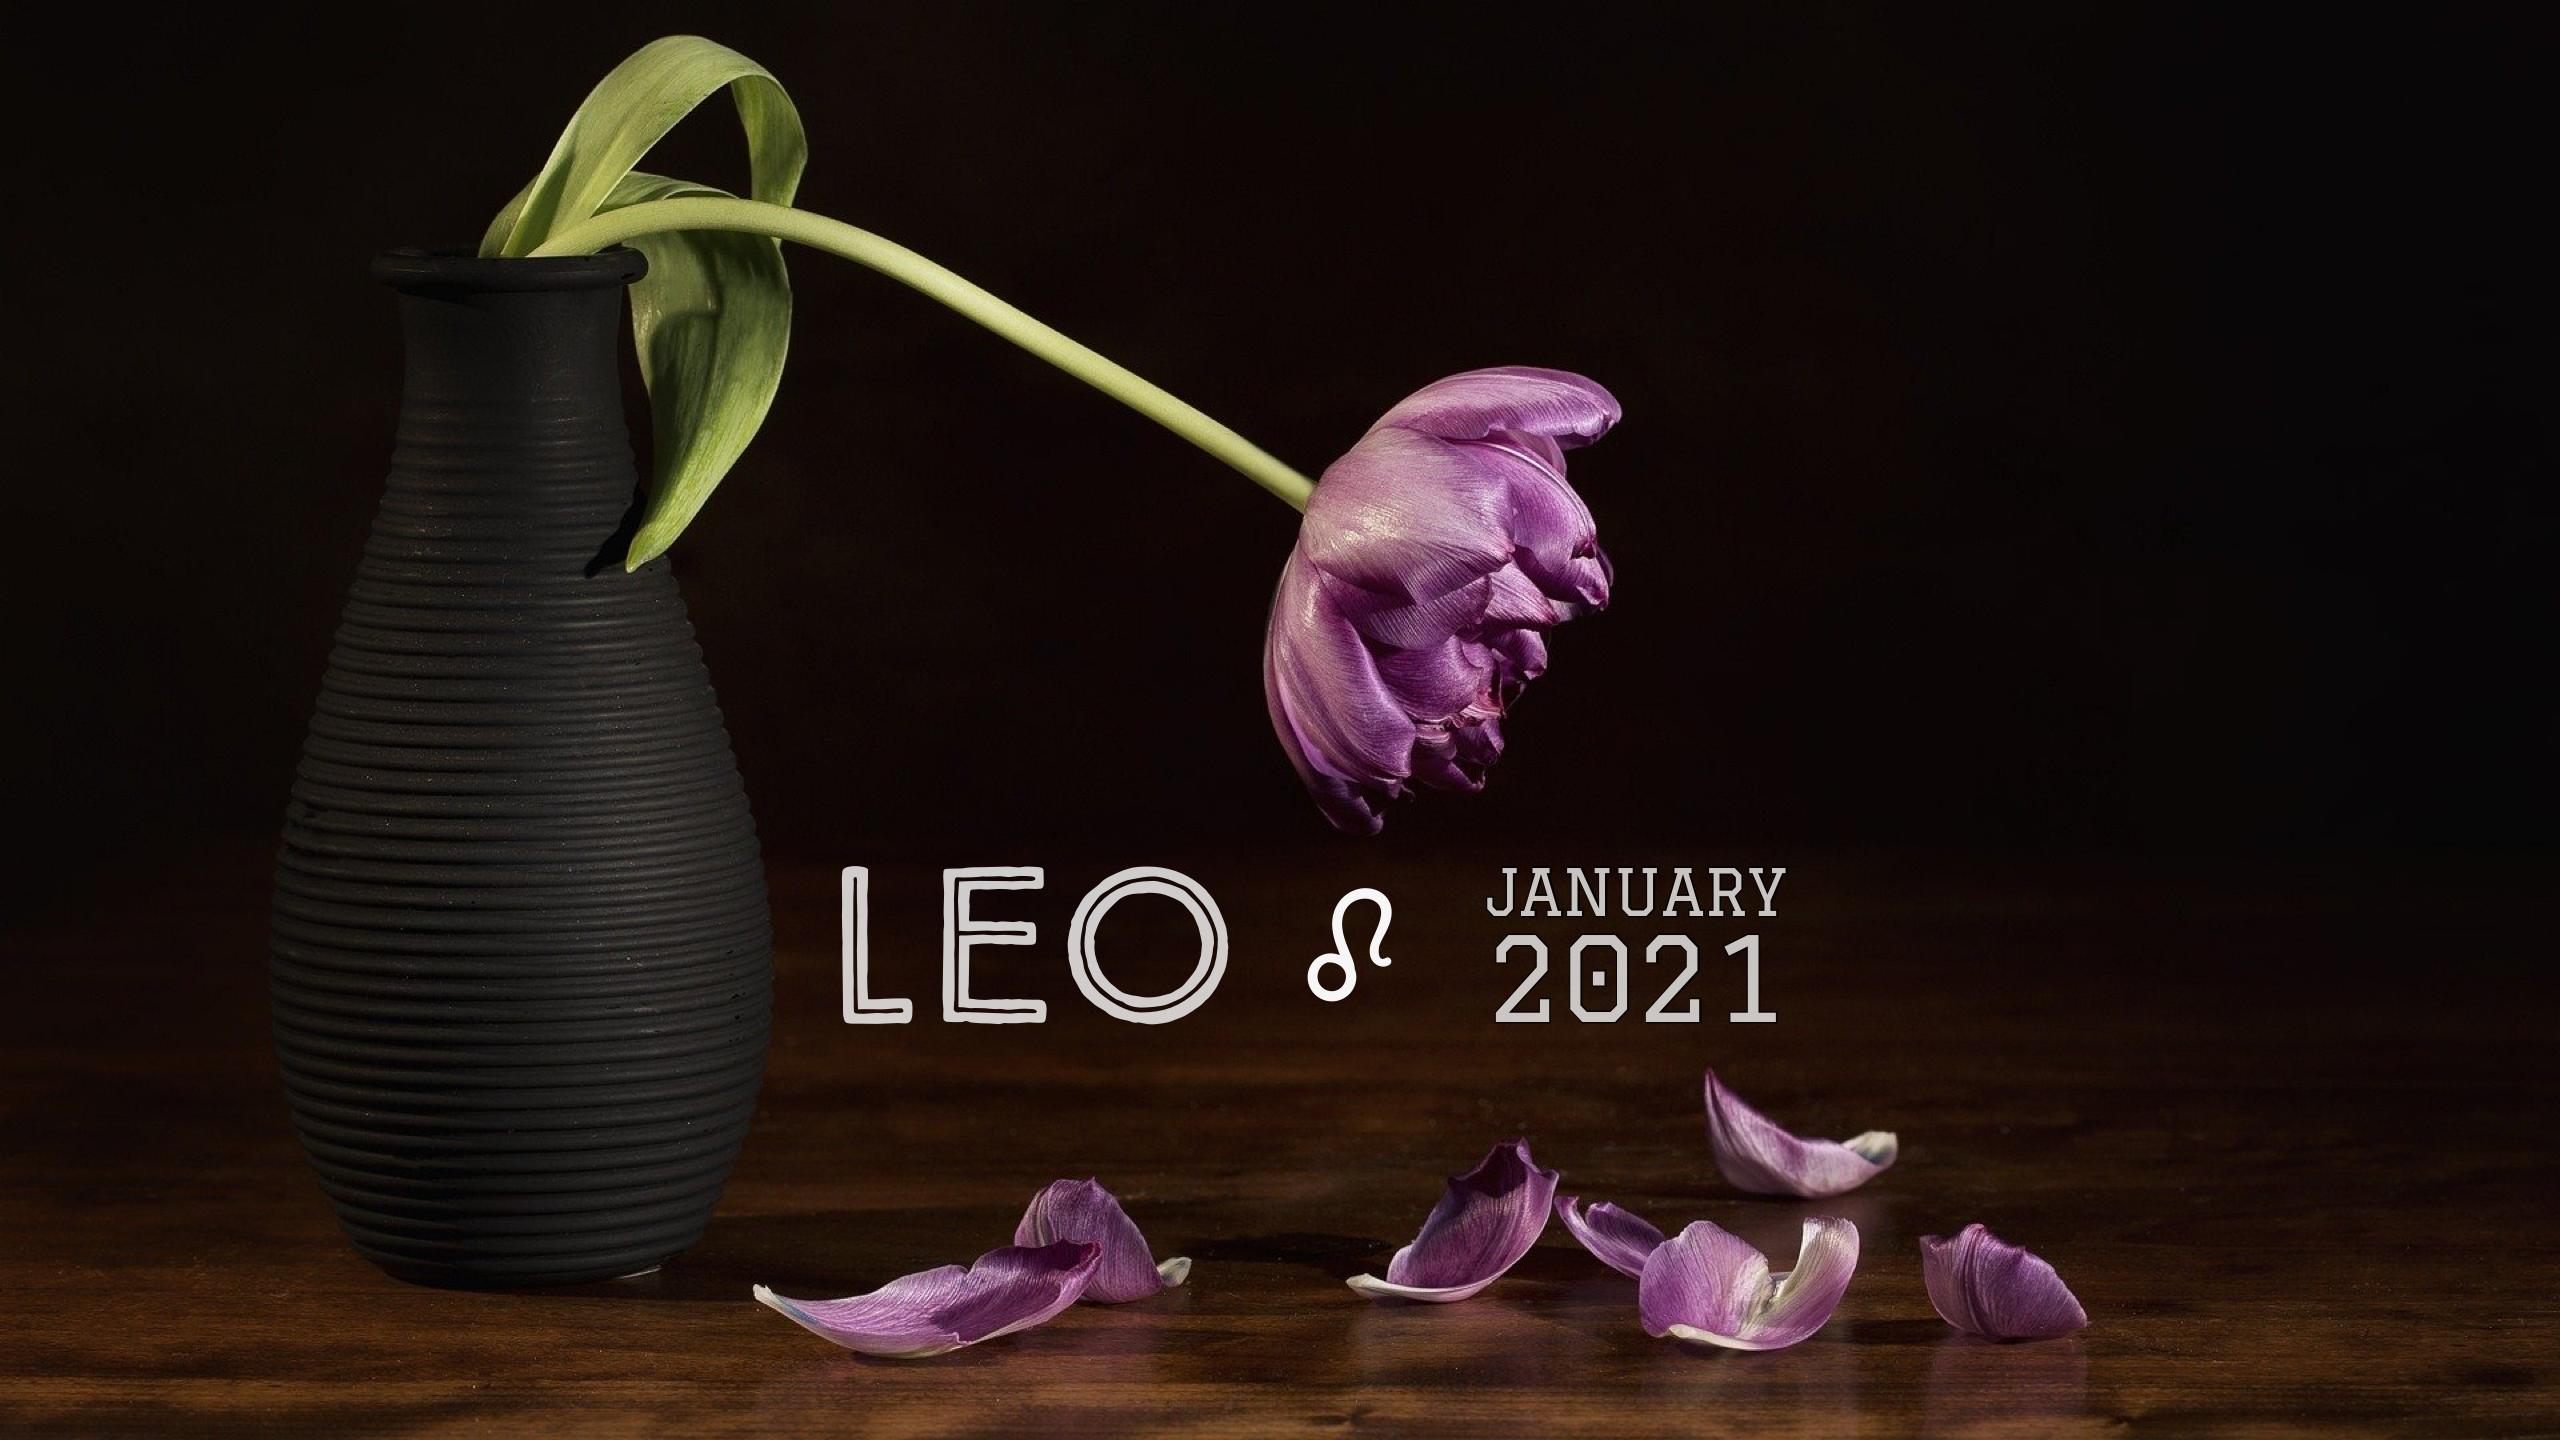 2021 01:Banner:05 Leo